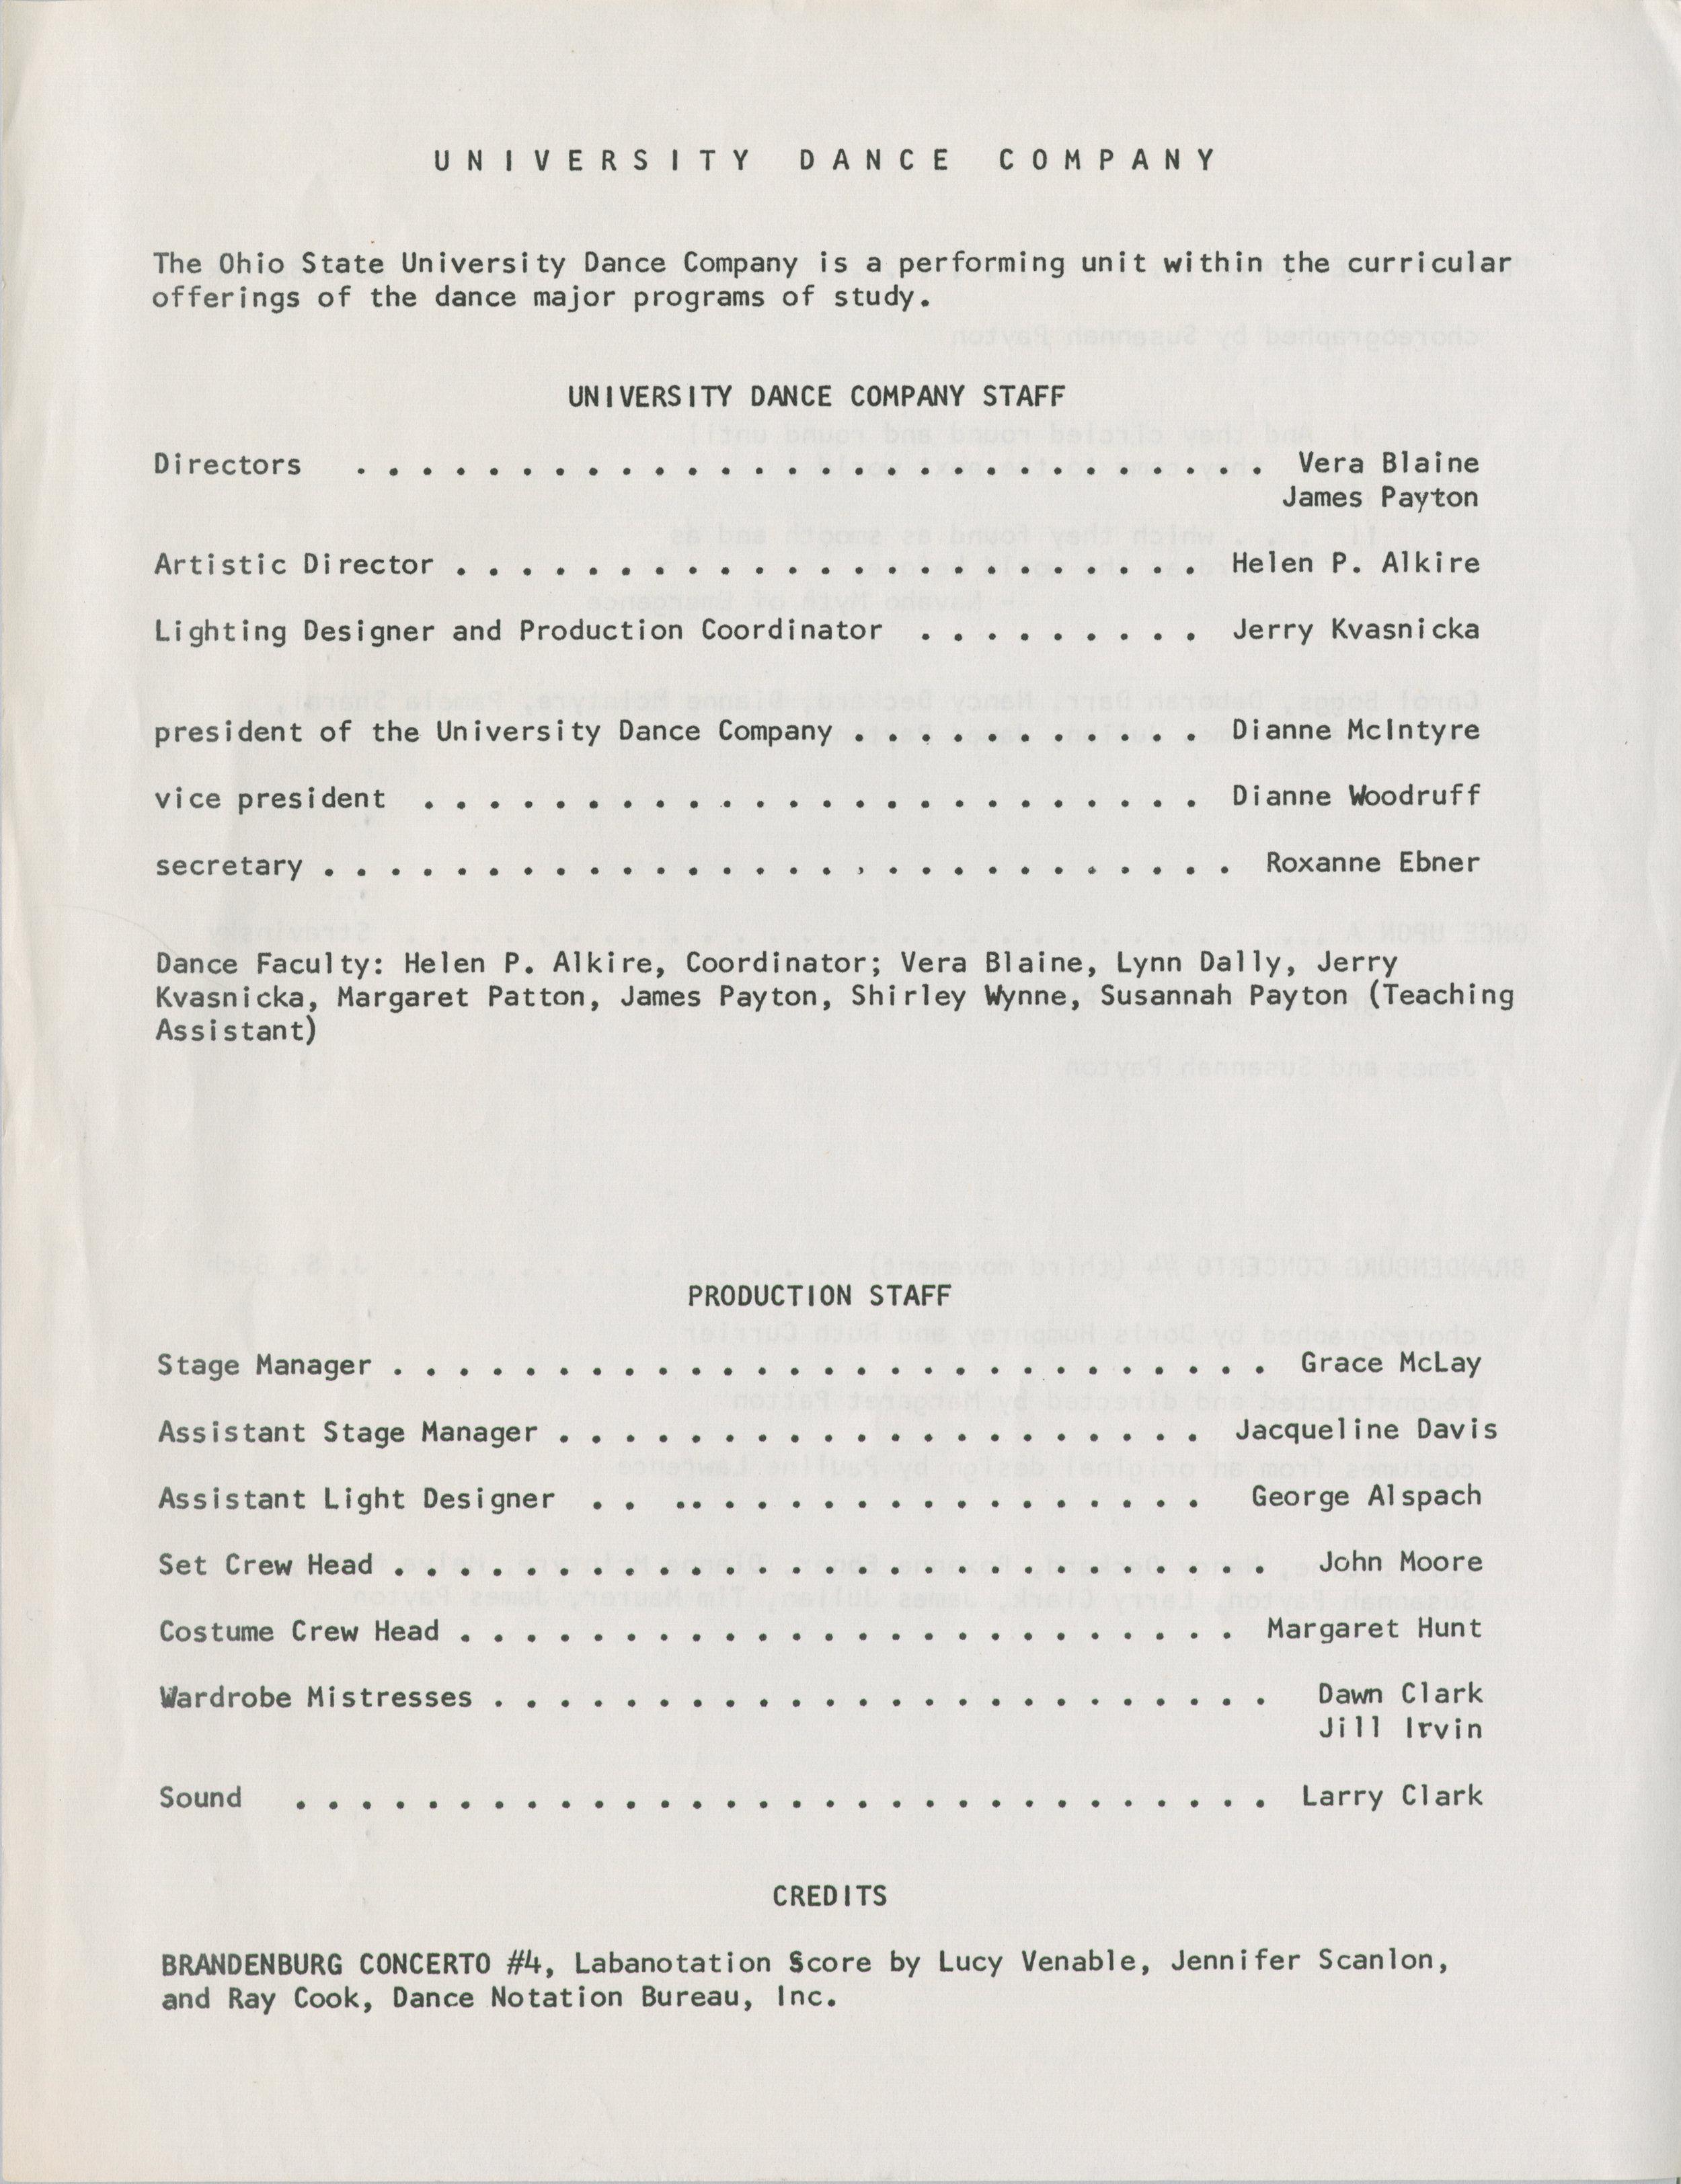 UDC_1968.1_DancePrograms-020-003.jpg